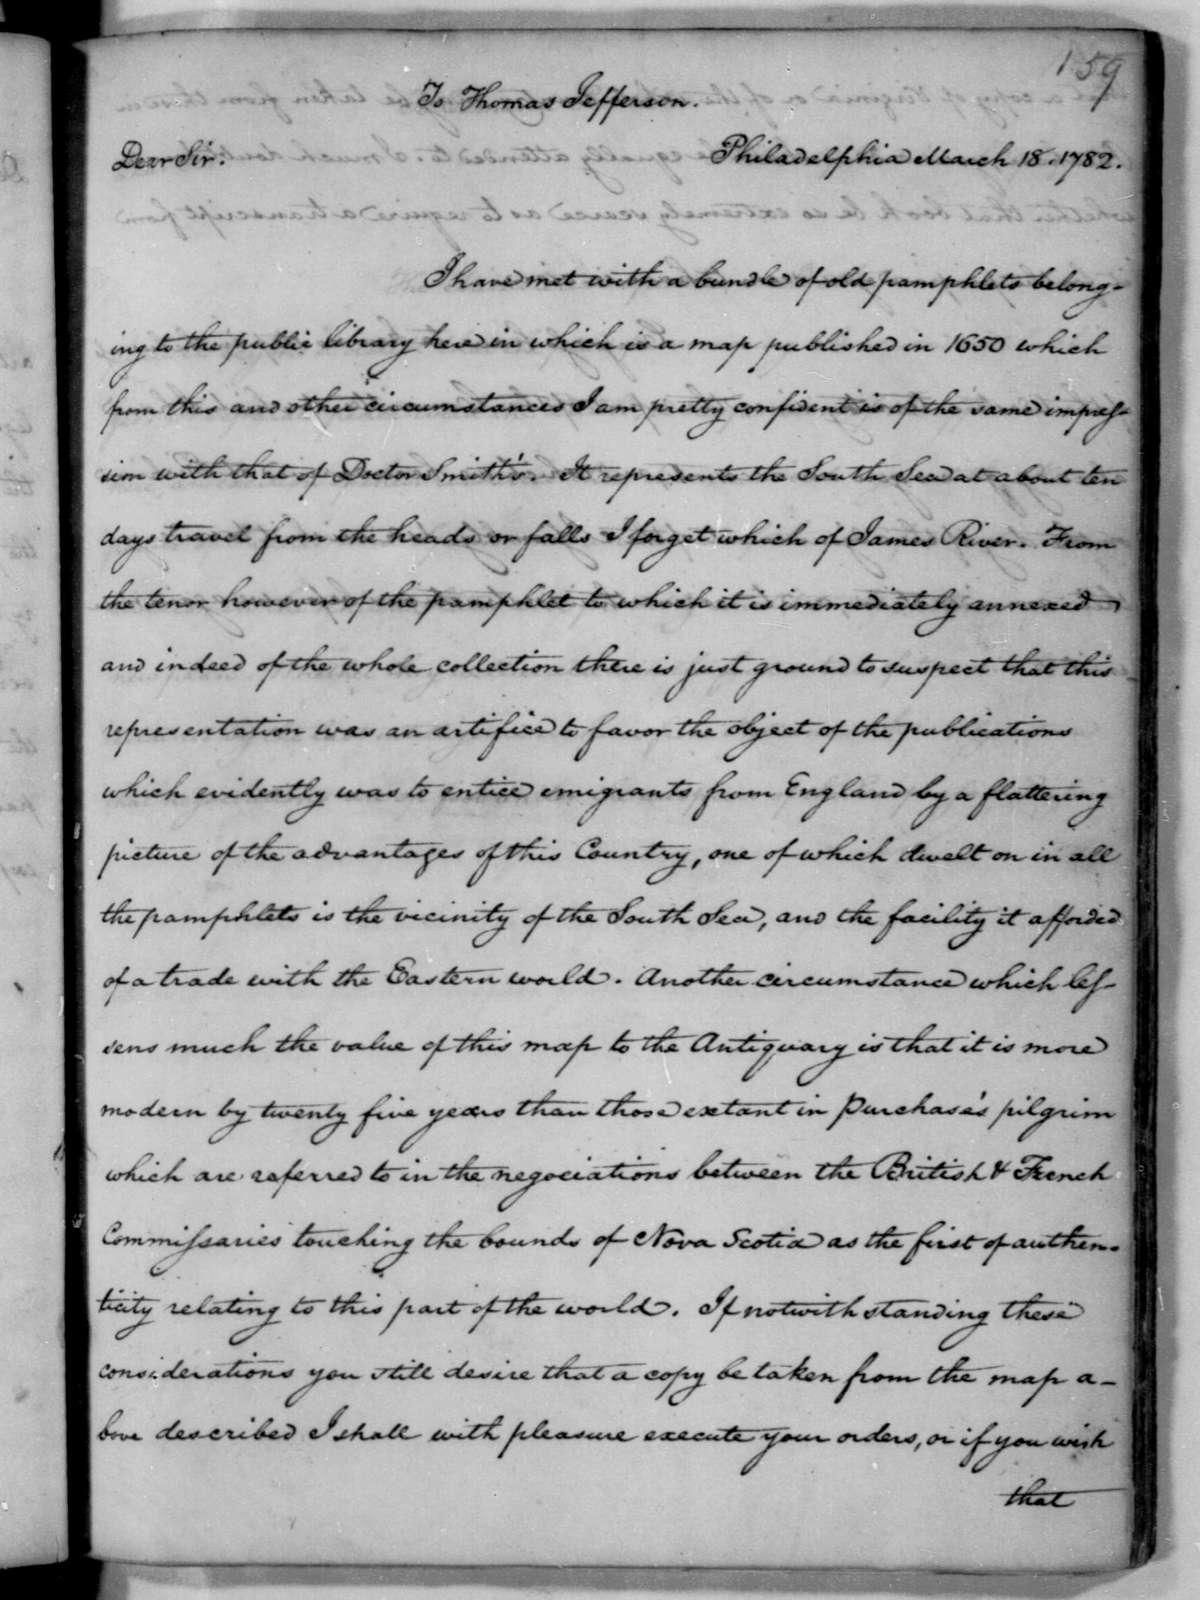 James Madison to Thomas Jefferson, March 18, 1782.